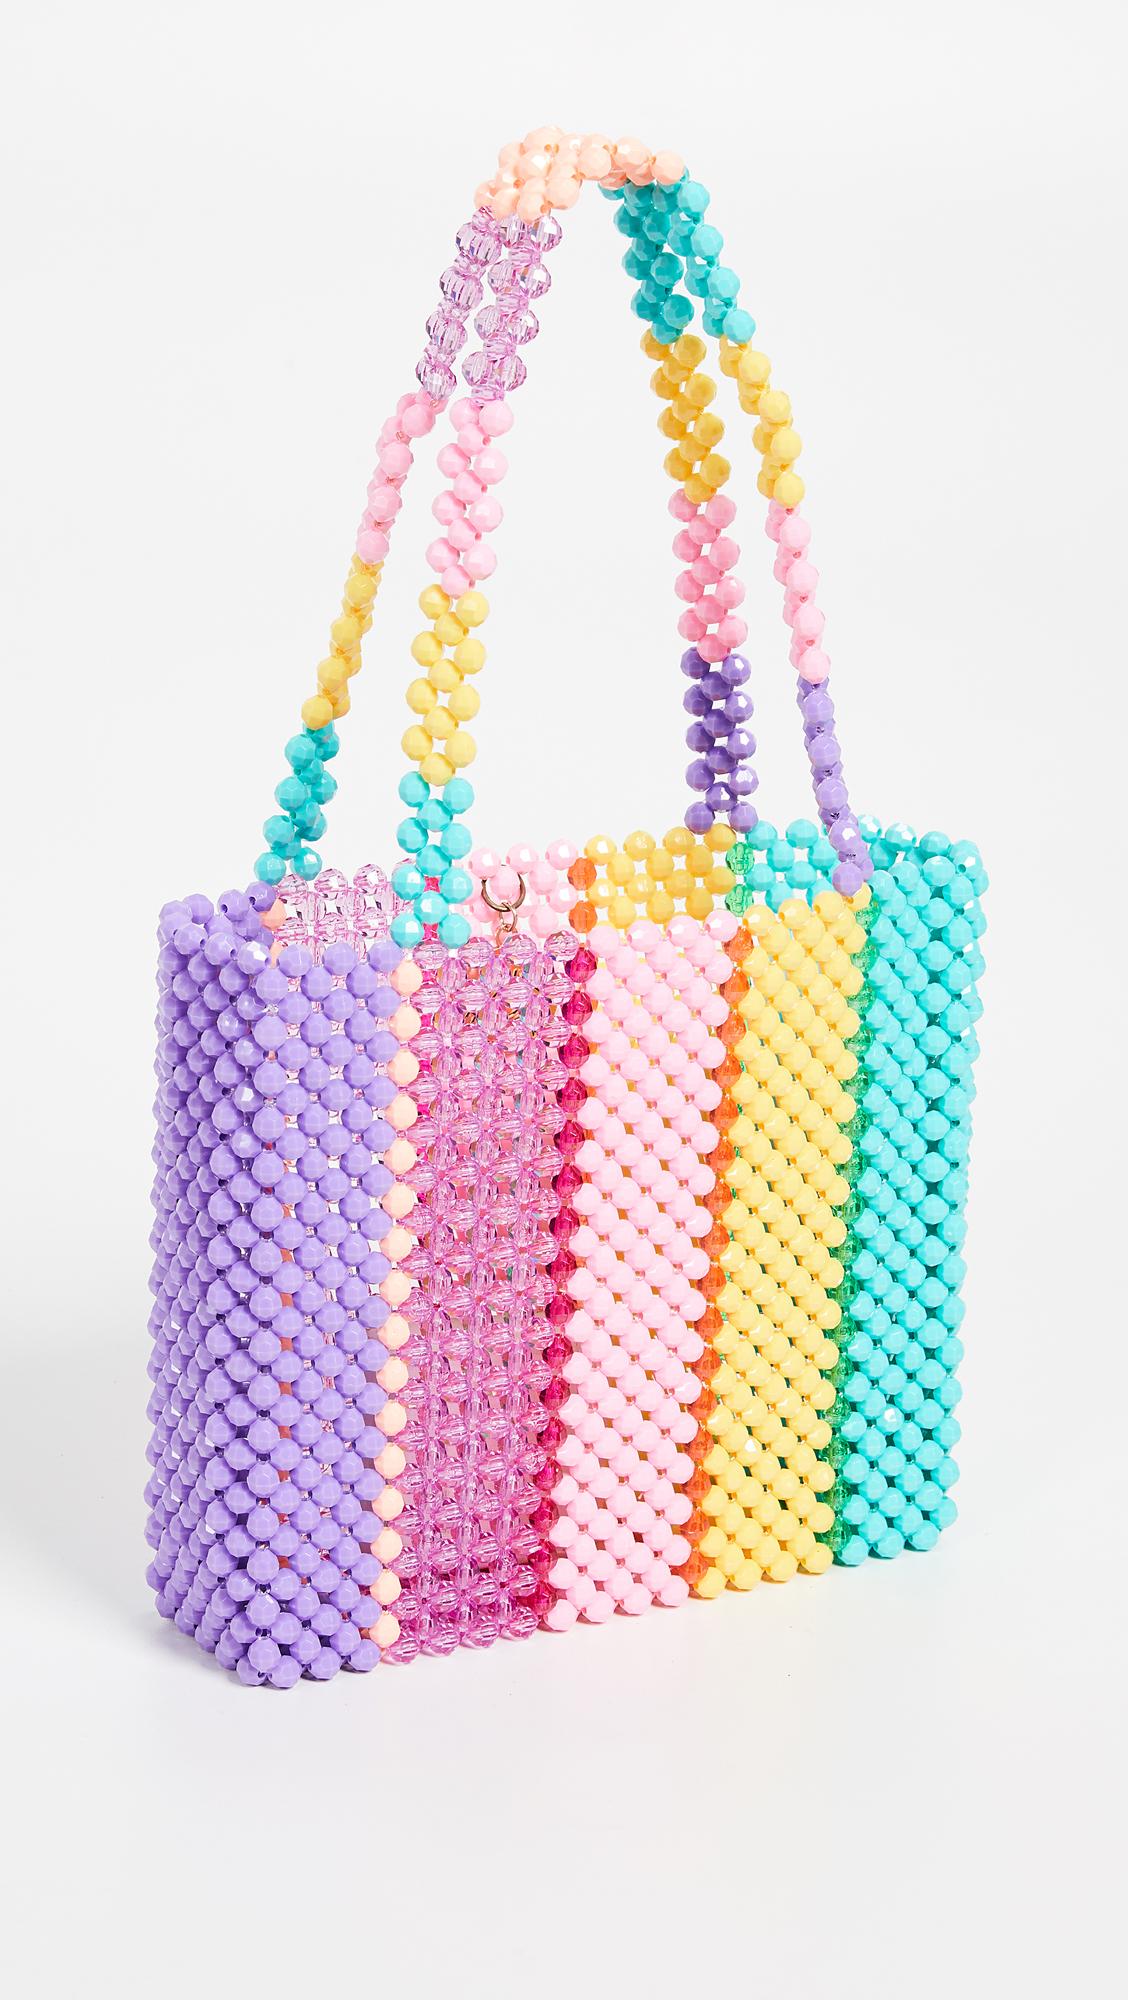 Super Cute Woven Beaded Bags by Susan Alexandra - Parfait Bag